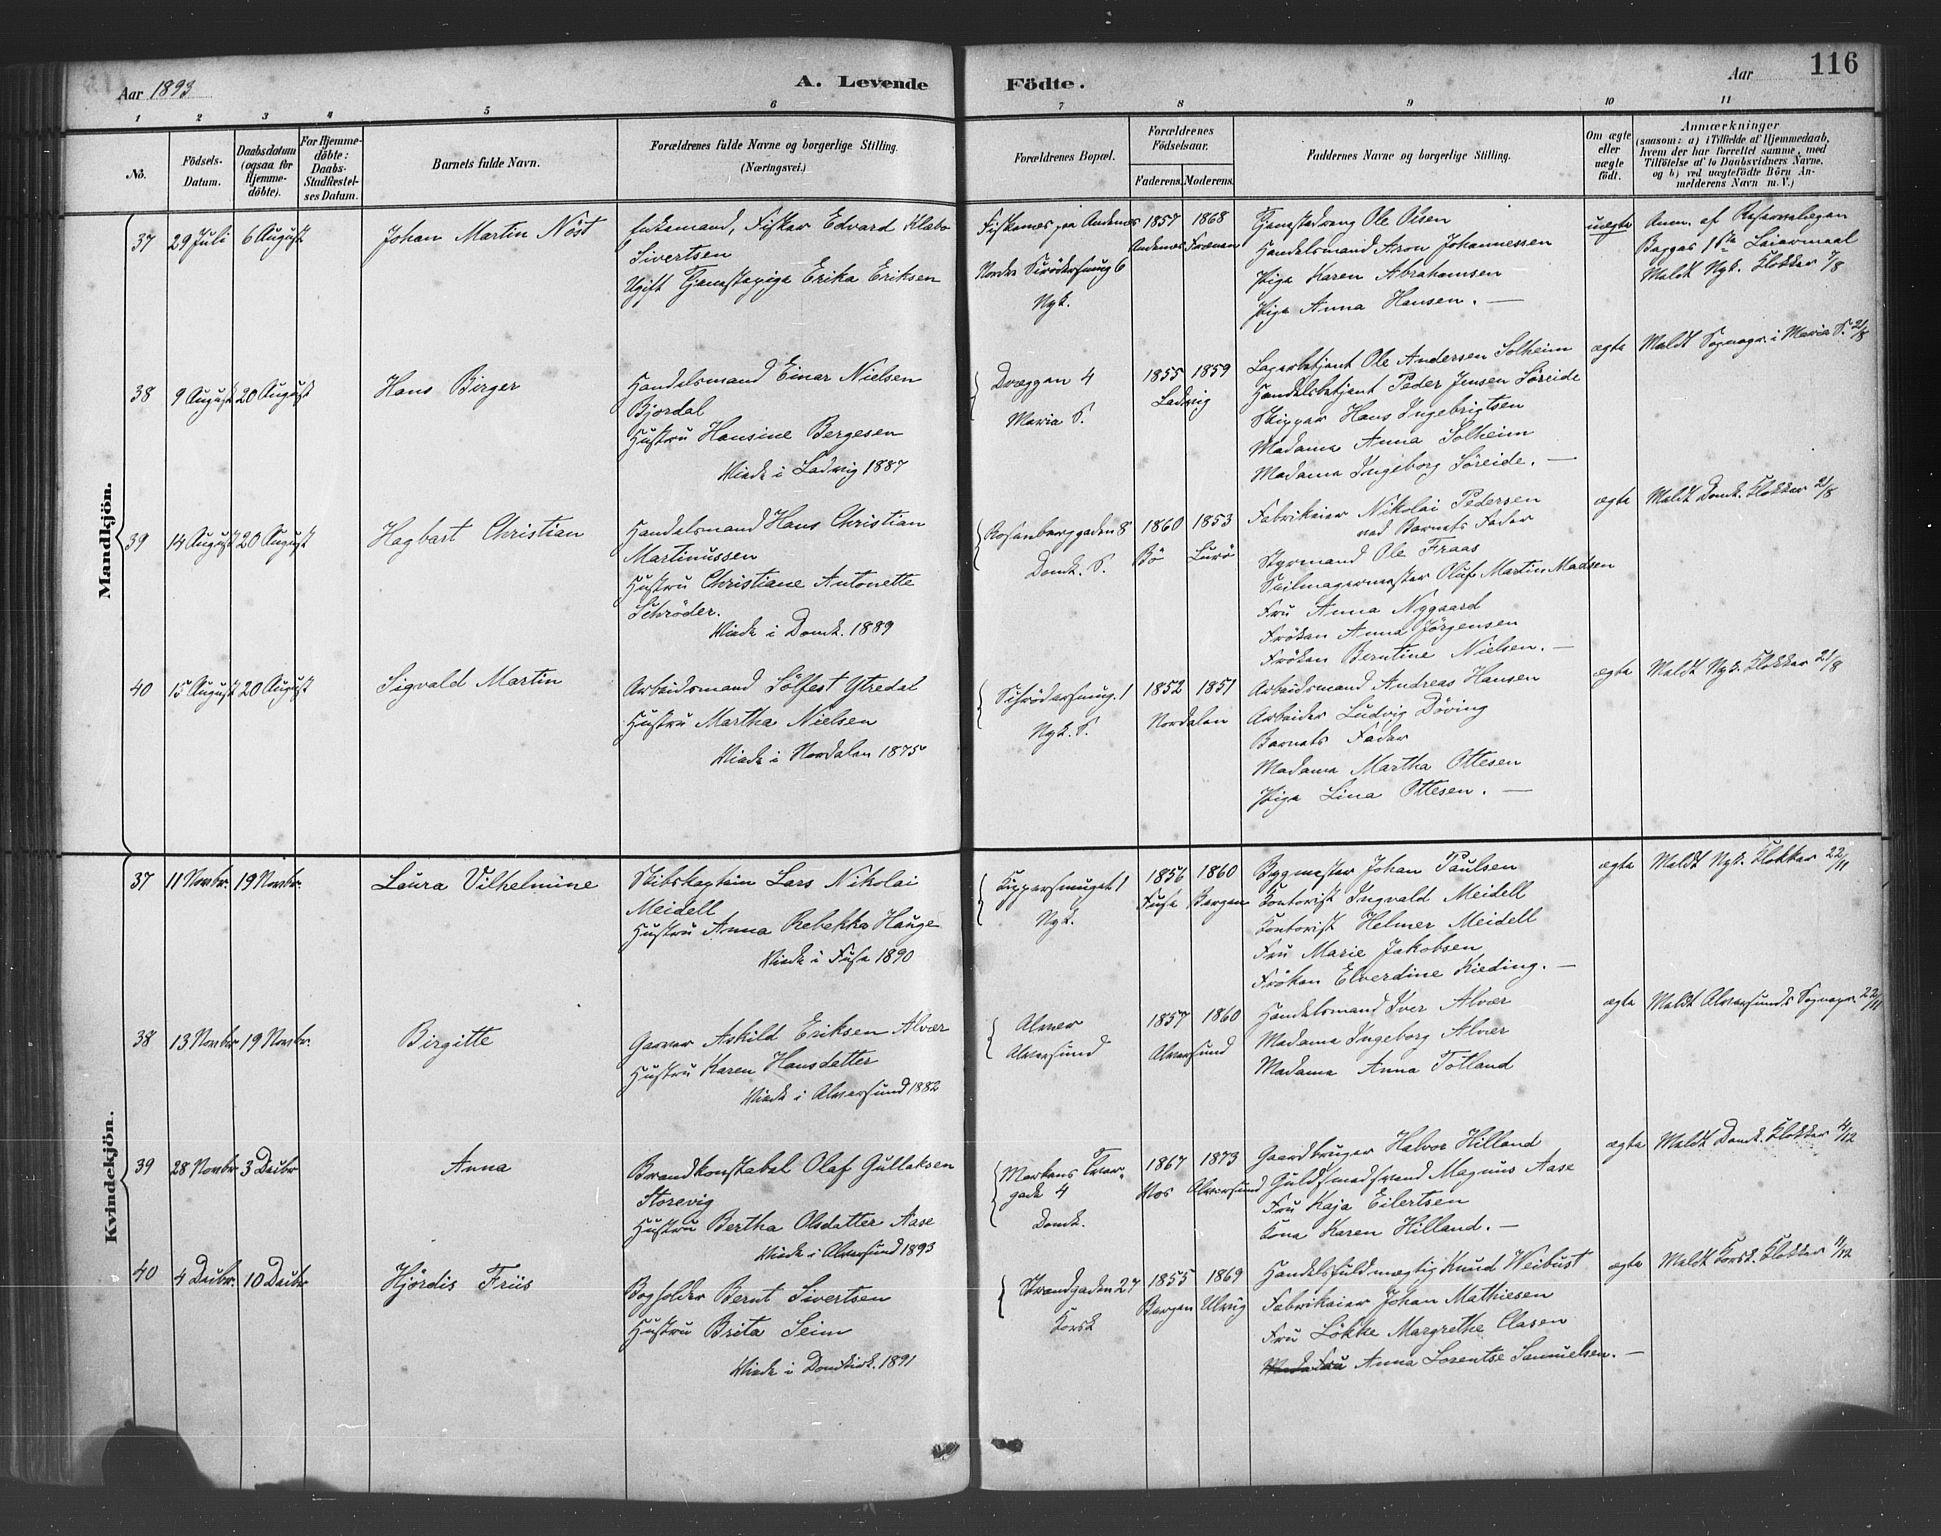 SAB, Fødselsstiftelsens sokneprestembete*, Ministerialbok nr. A 2, 1884-1900, s. 116